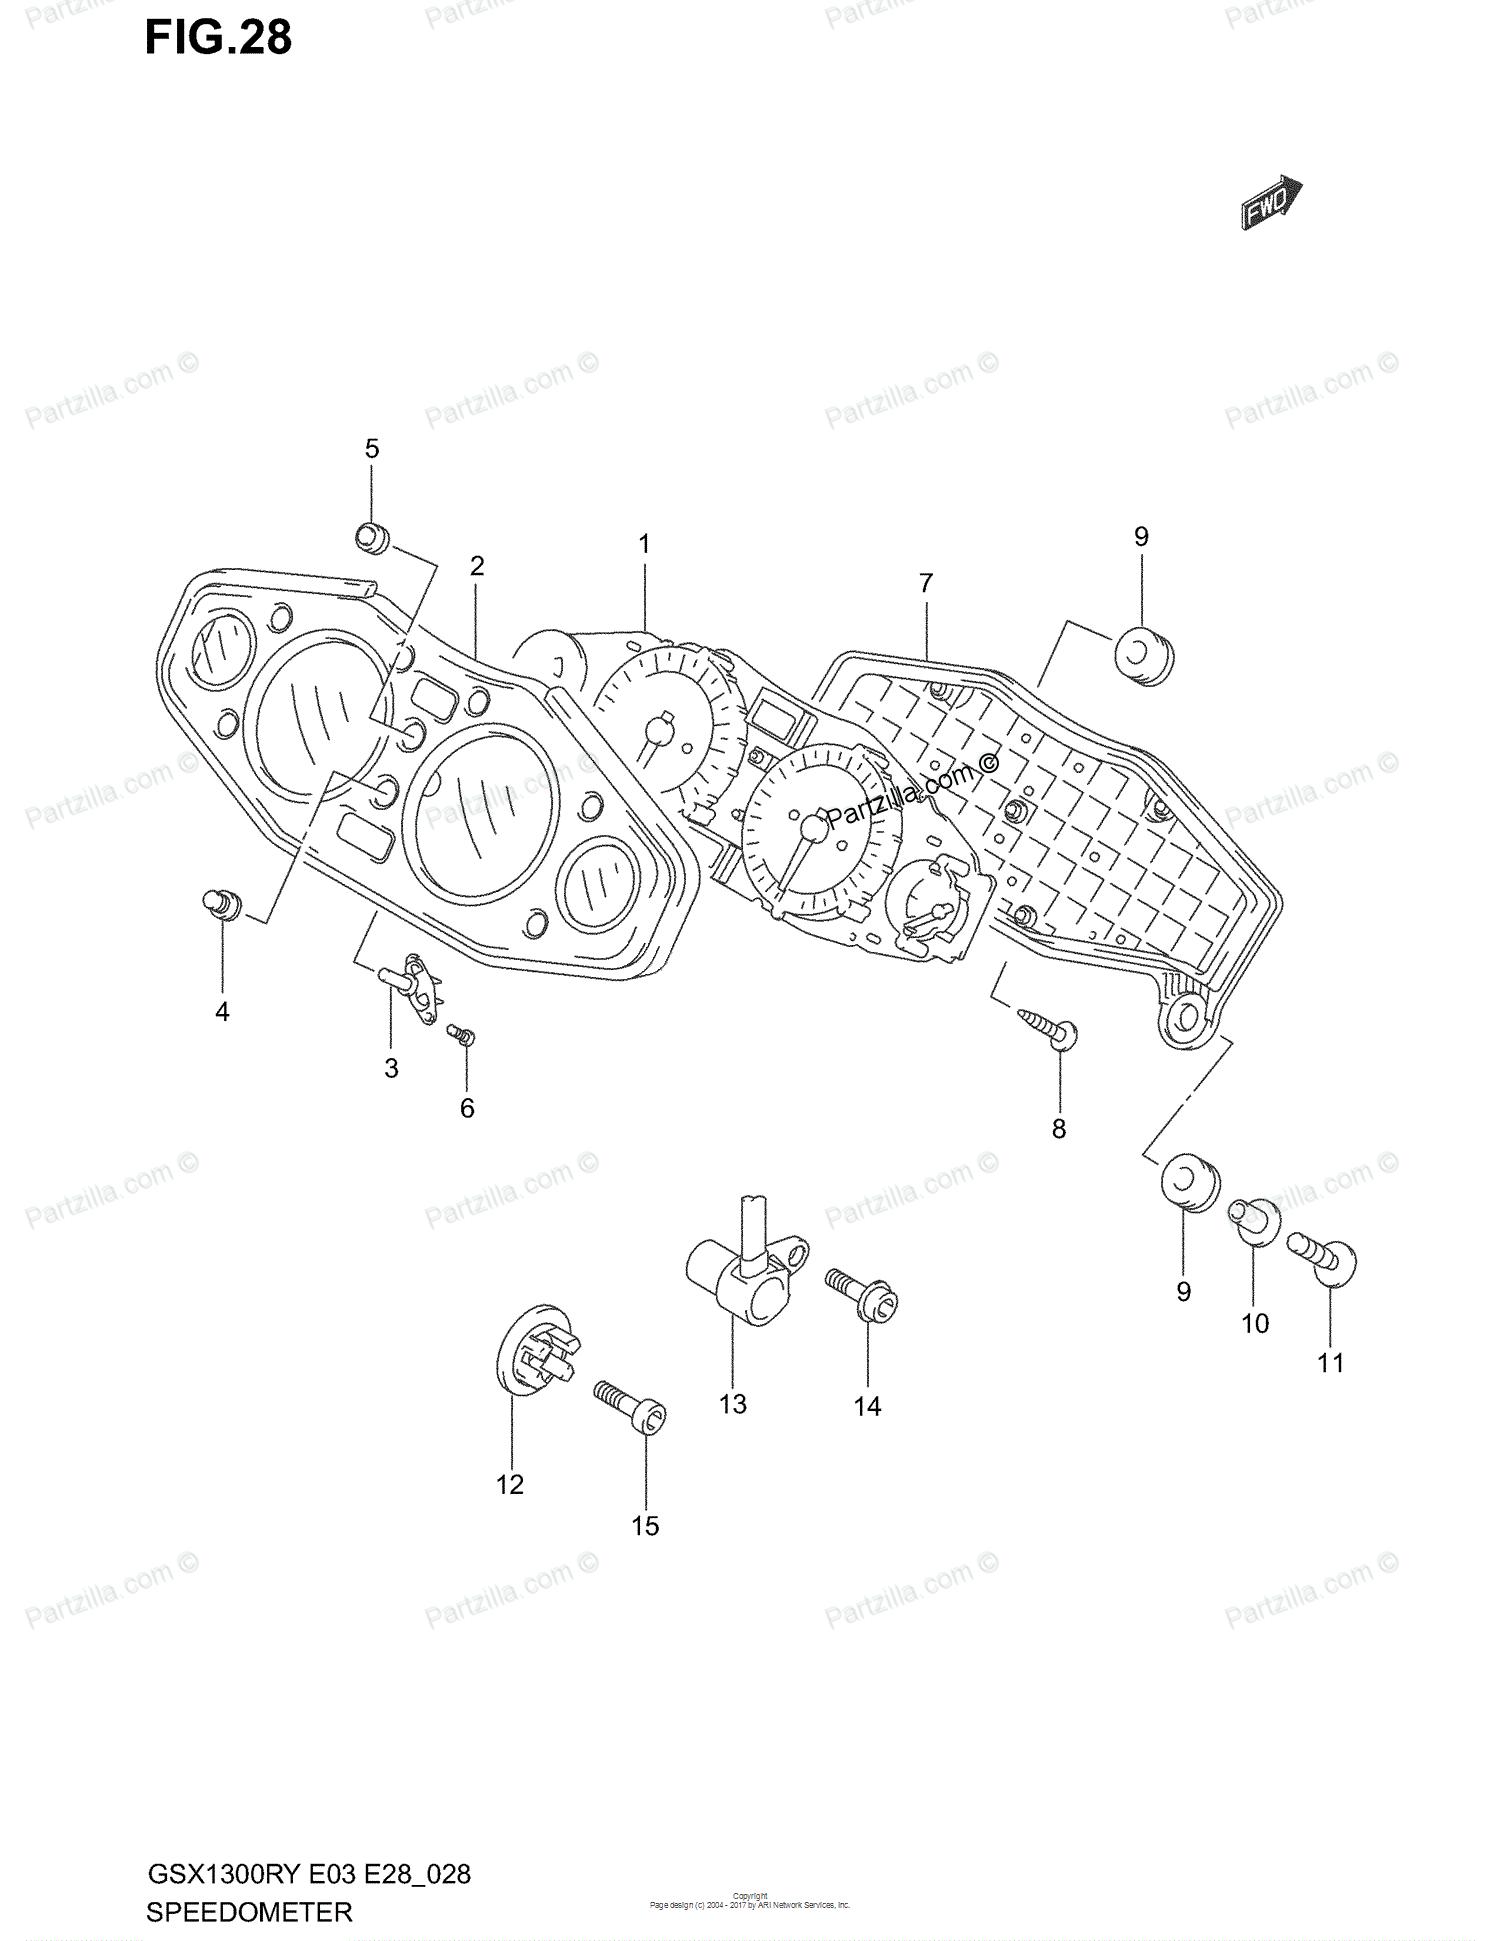 xl600r wiring diagram wiring diagrams schema